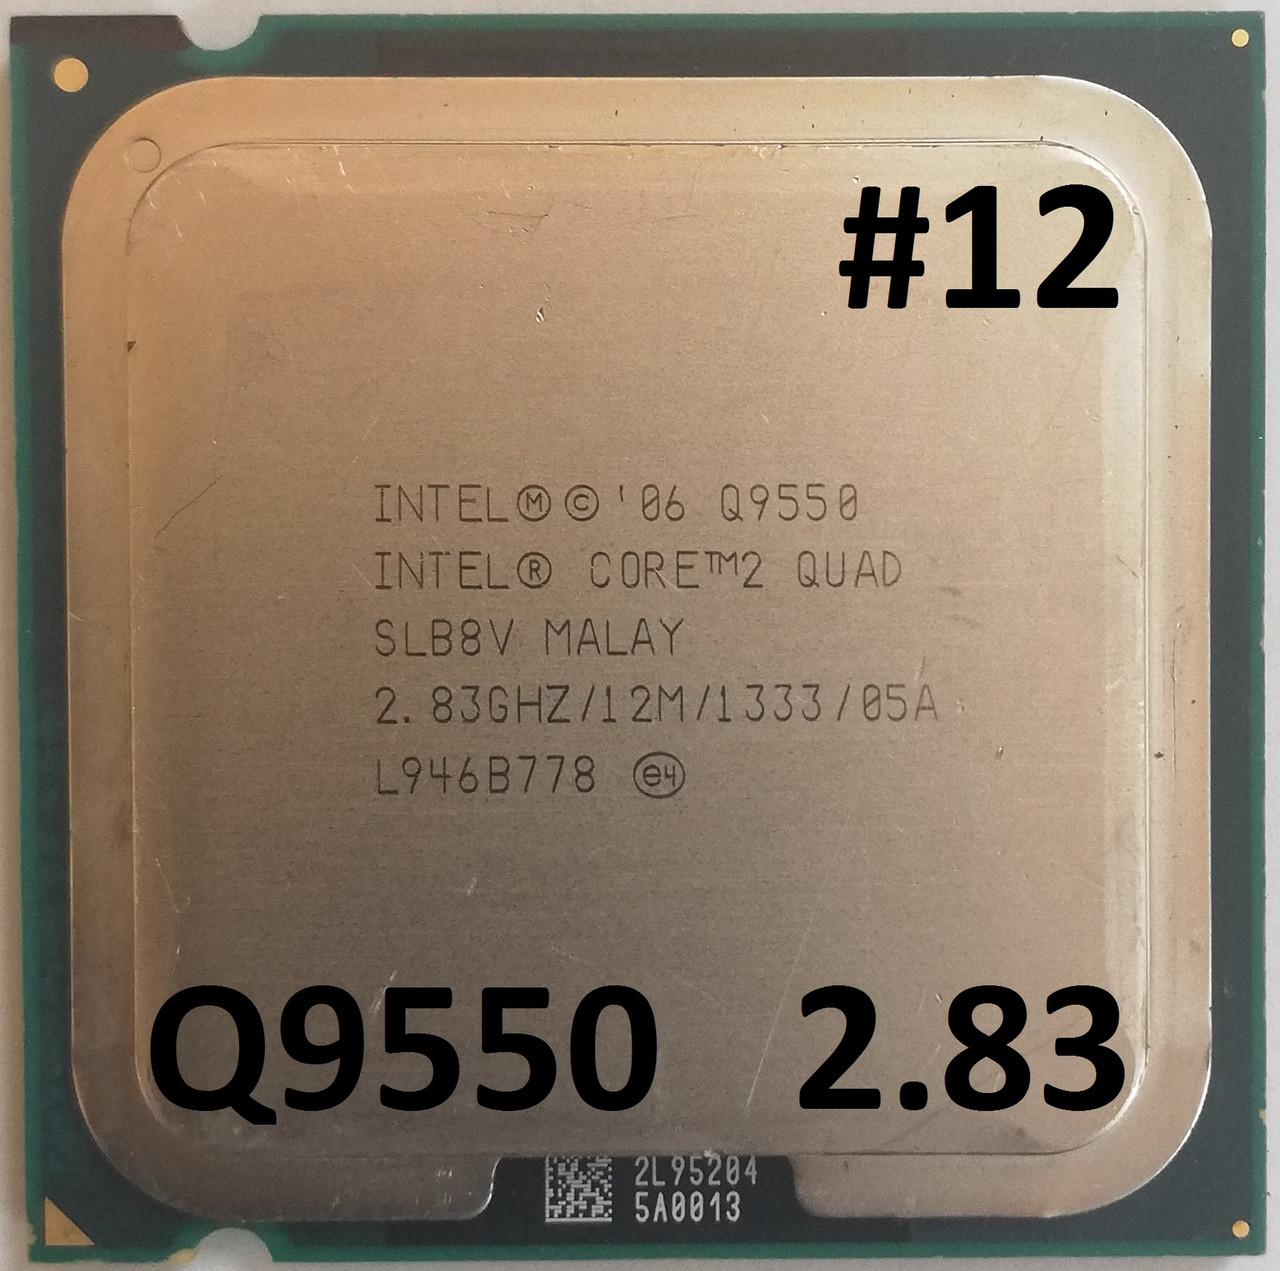 Процессор ЛОТ#12 Intel® Core™2 Quad Q9550 SLB8V 2.83GHz 12M Cache 1333 MHz FSB Soket 775 Б/У